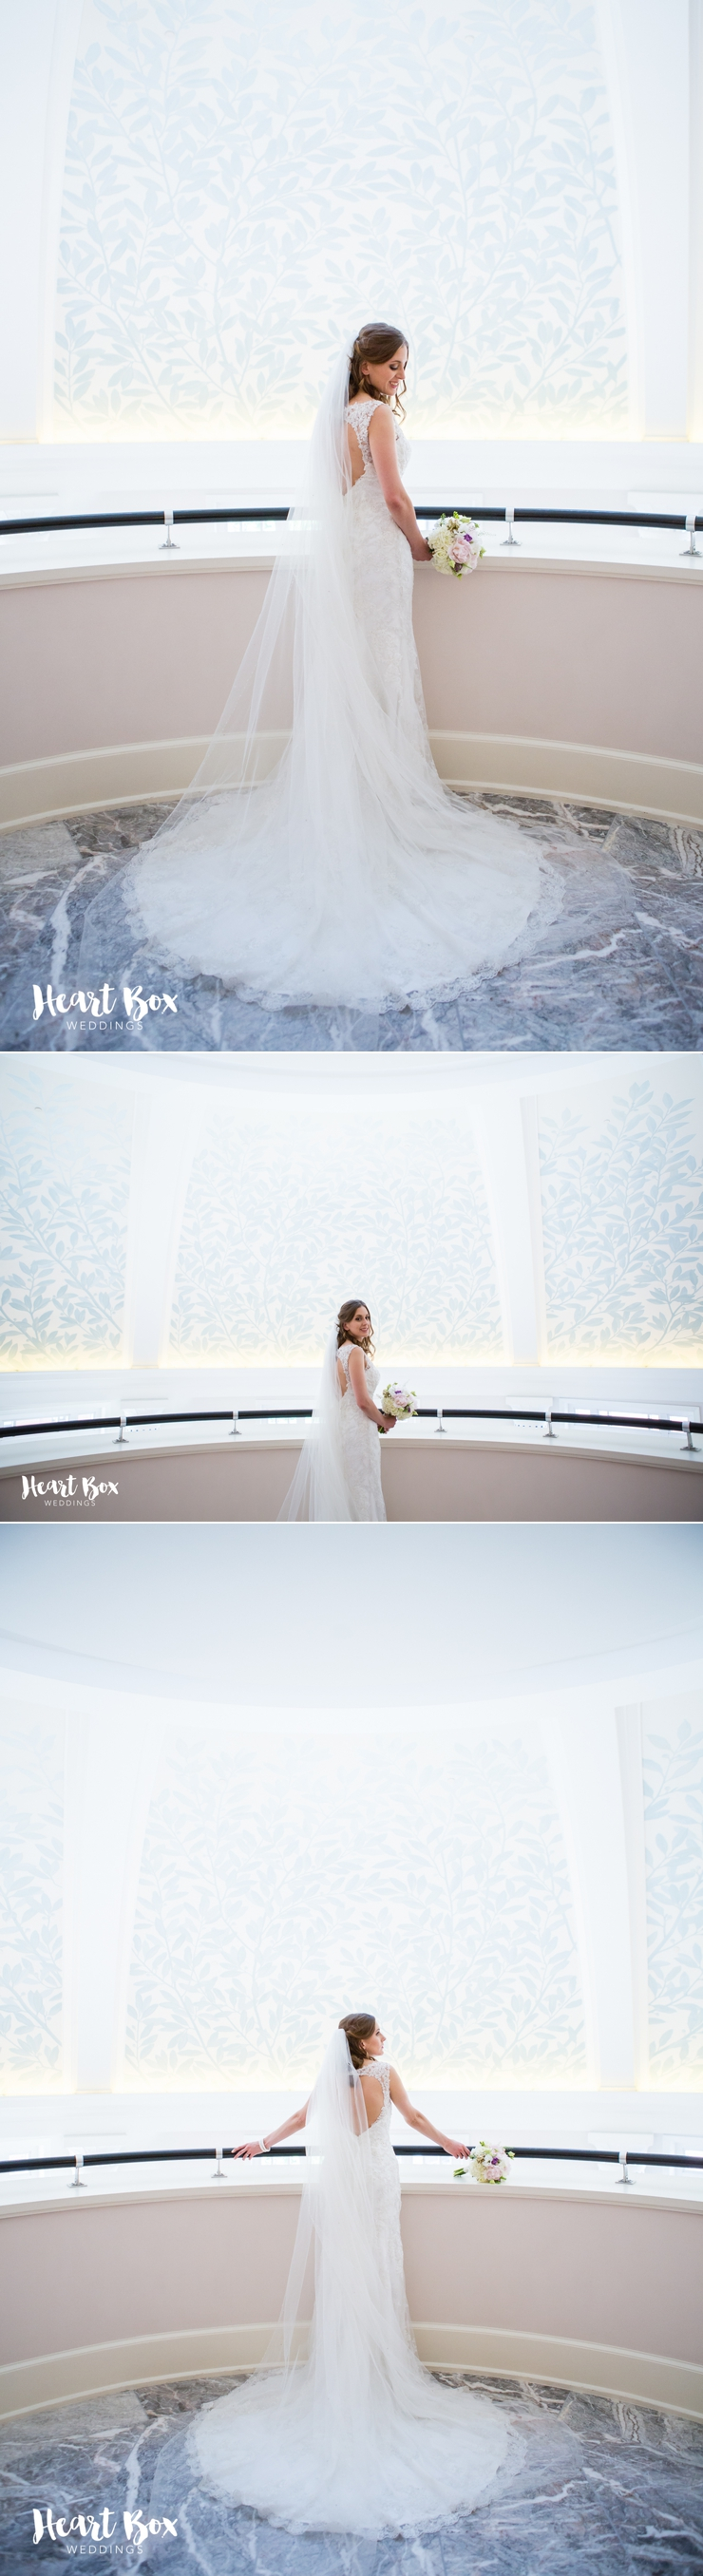 Sarah Lubrano Bridal Blog Collages 3.jpg